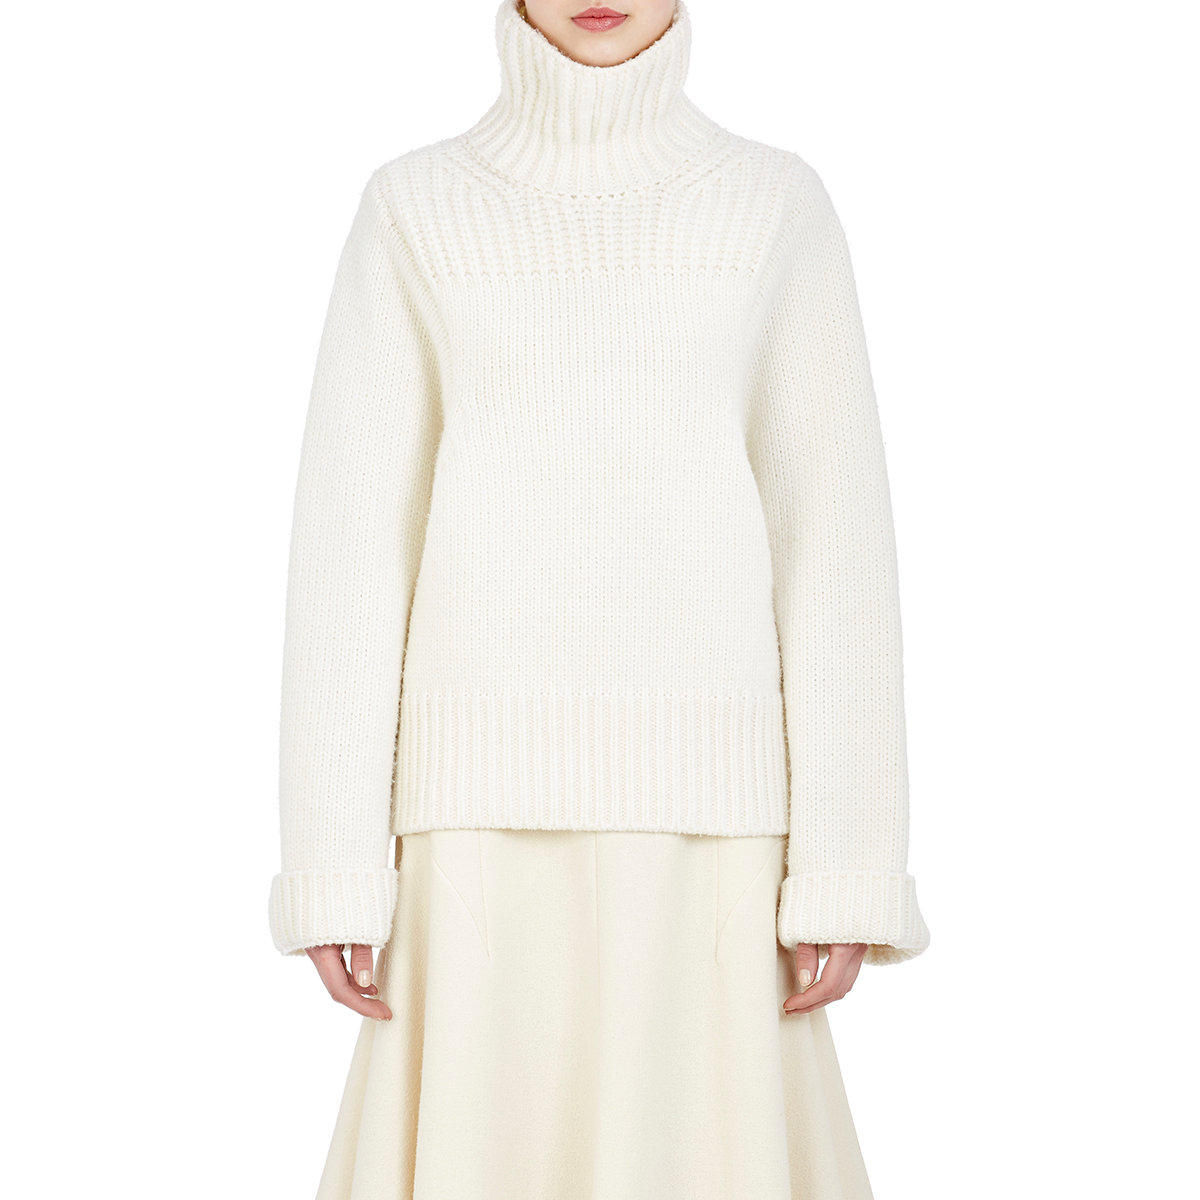 White Turtleneck Knit Sweater 24